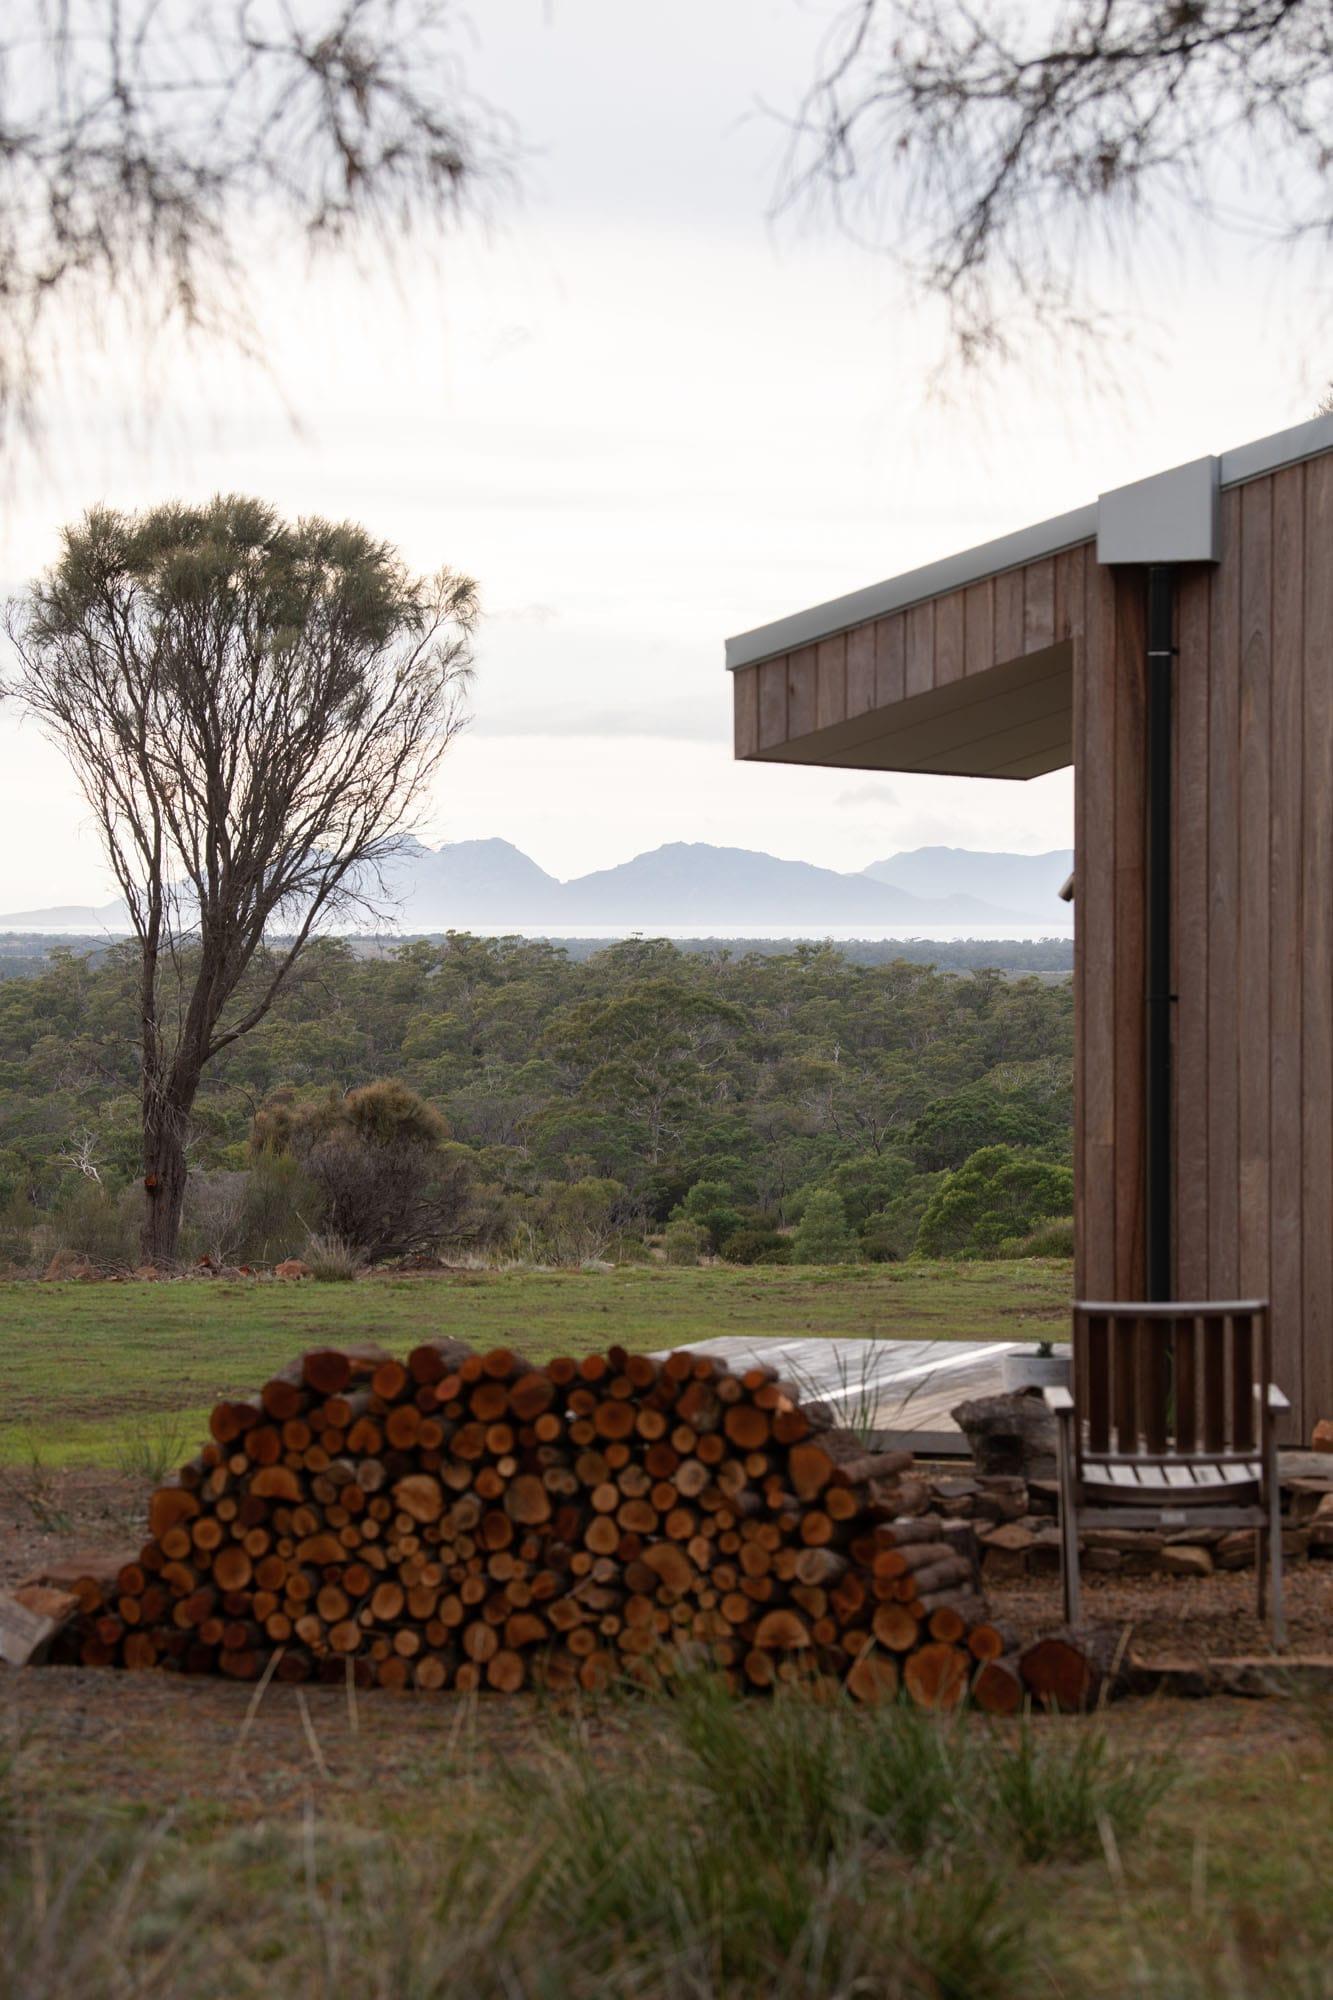 Wood pile outside sustainable house